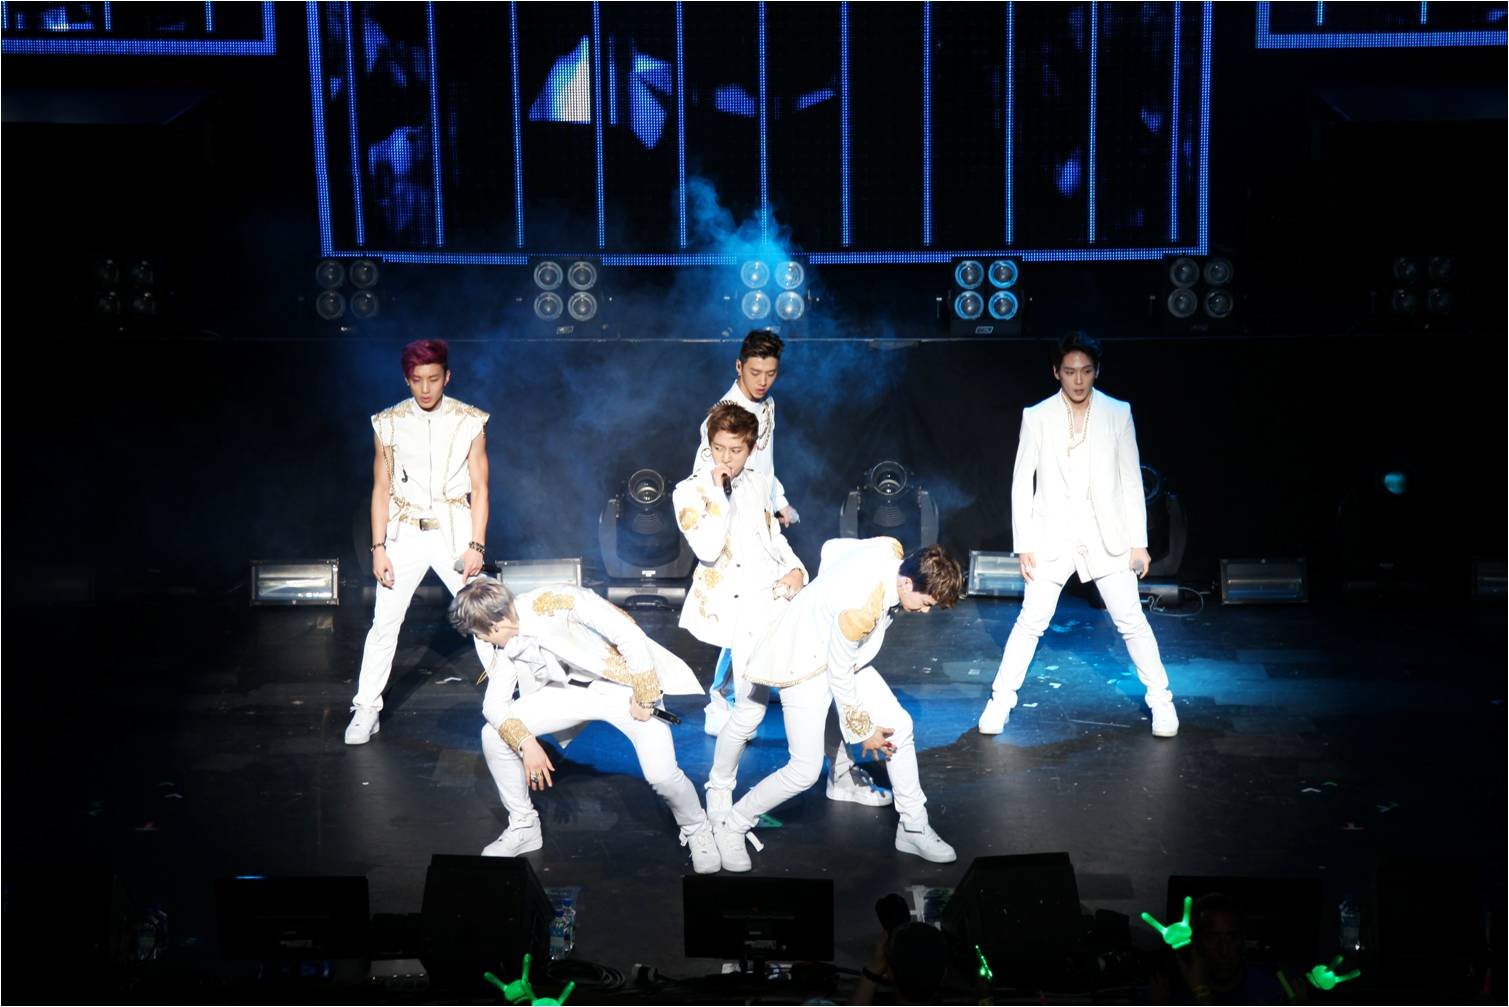 Recap Bap Treats Fans To Unforgettable Show In Washington Dc Soompi